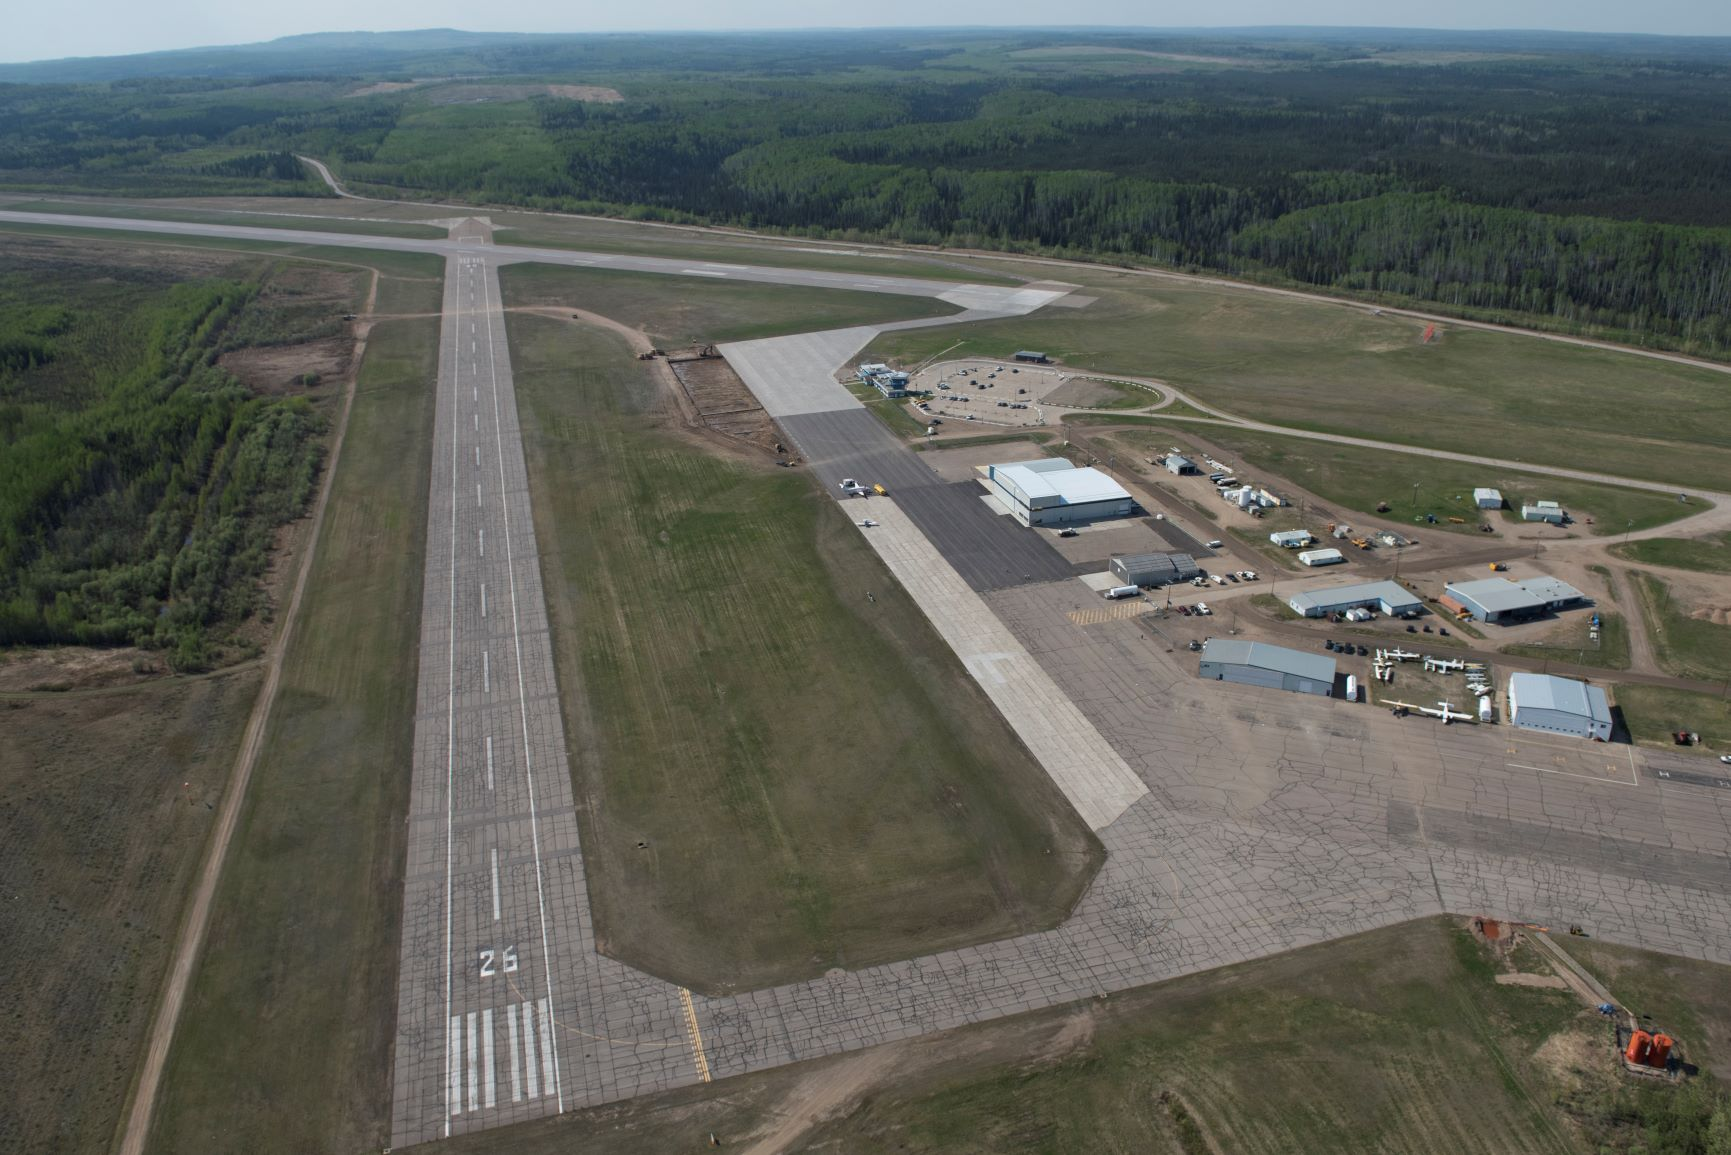 21-06-15 runway aerial med.jpg